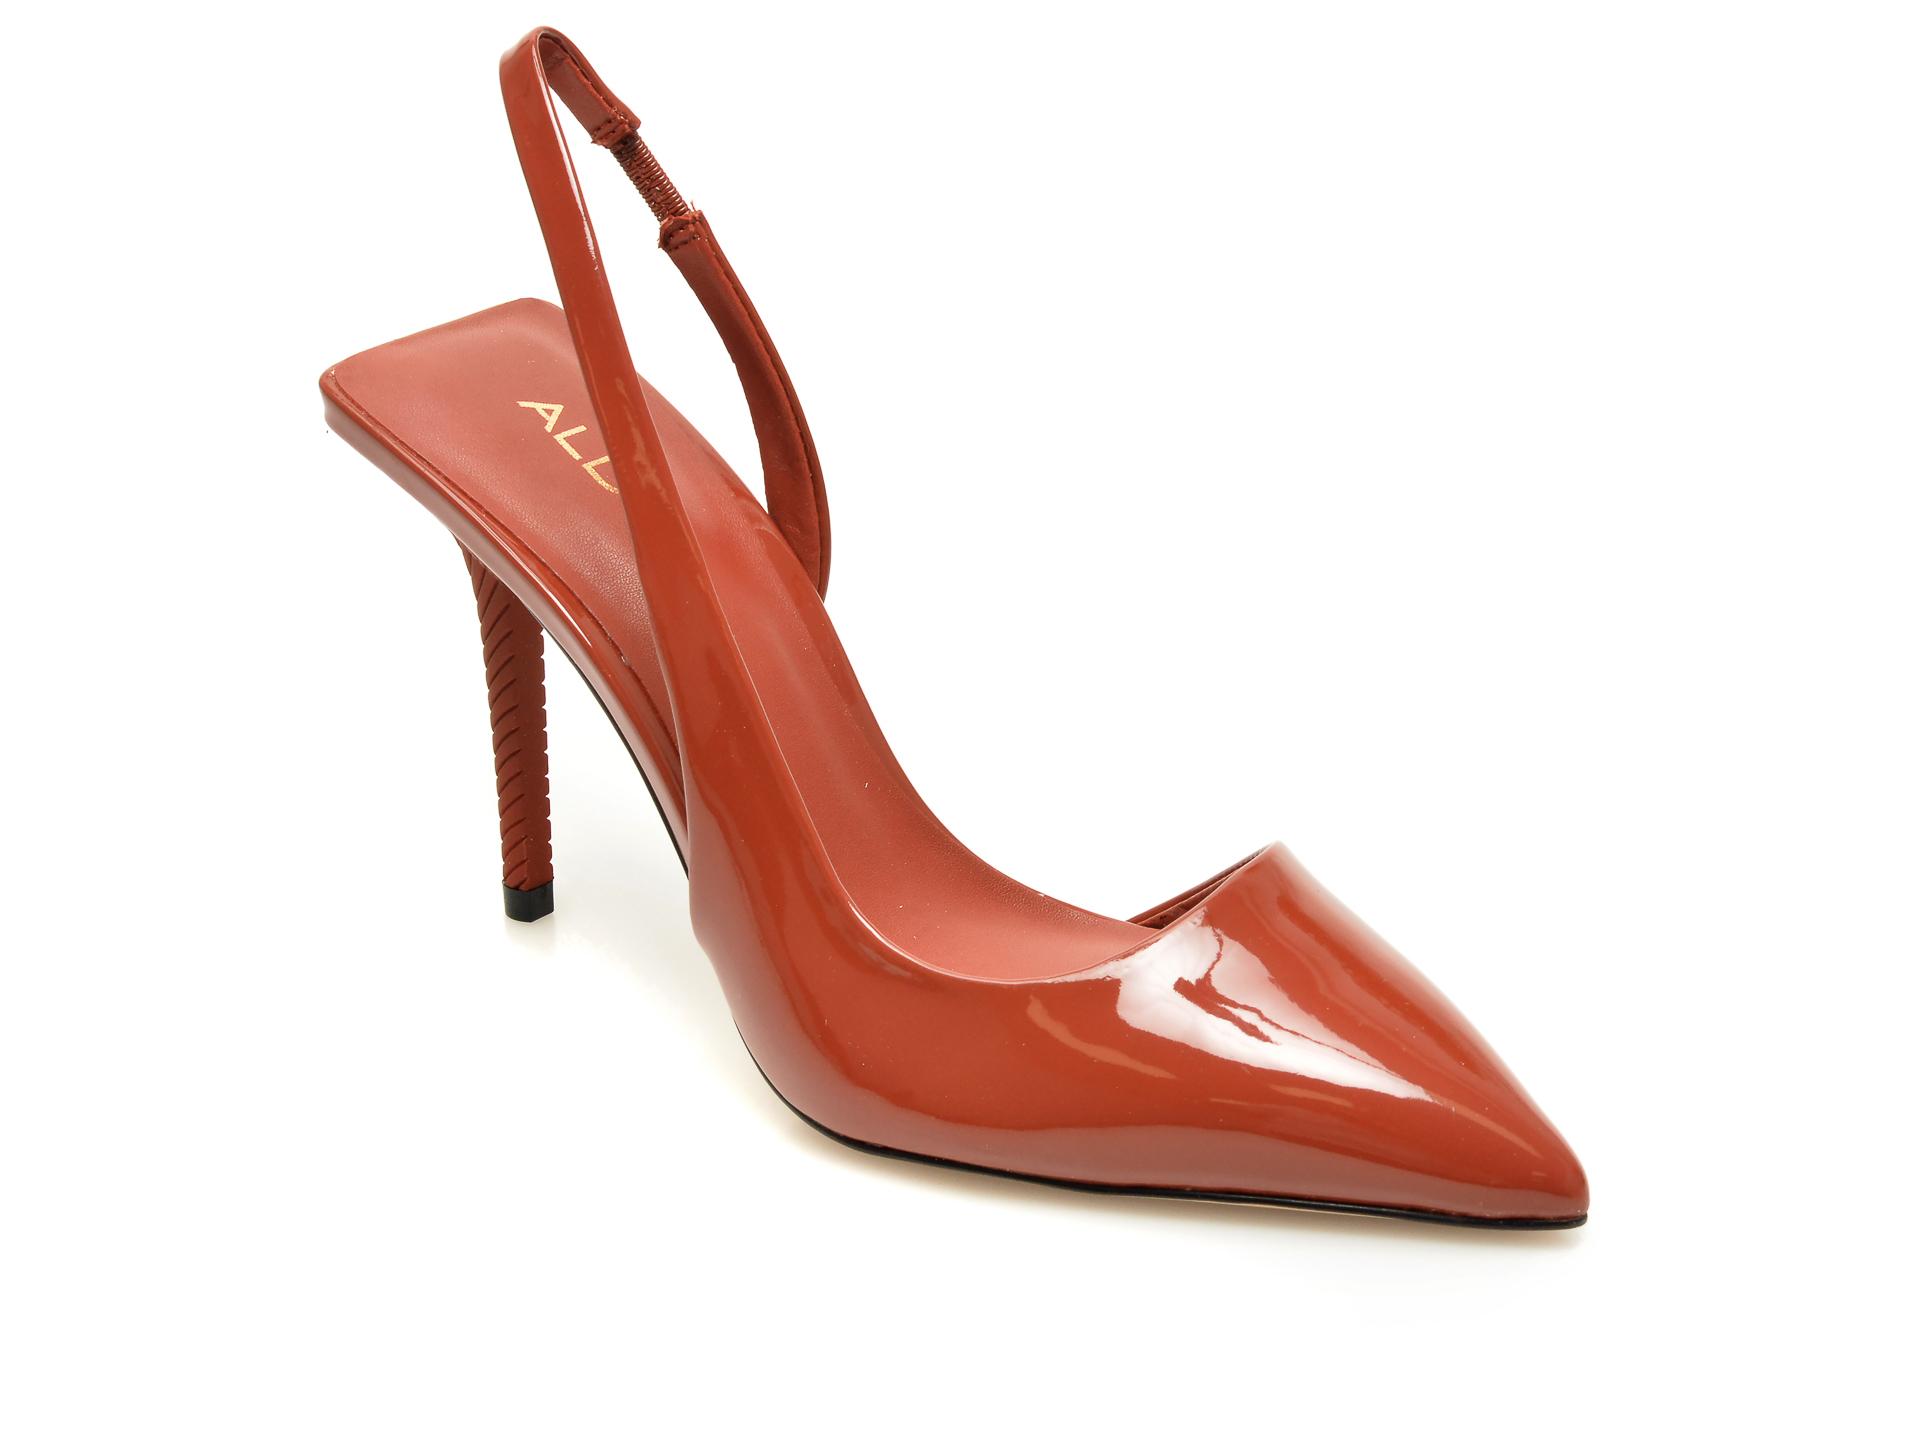 Pantofi ALDO rosii, Tirarith600, din piele ecologica imagine otter.ro 2021